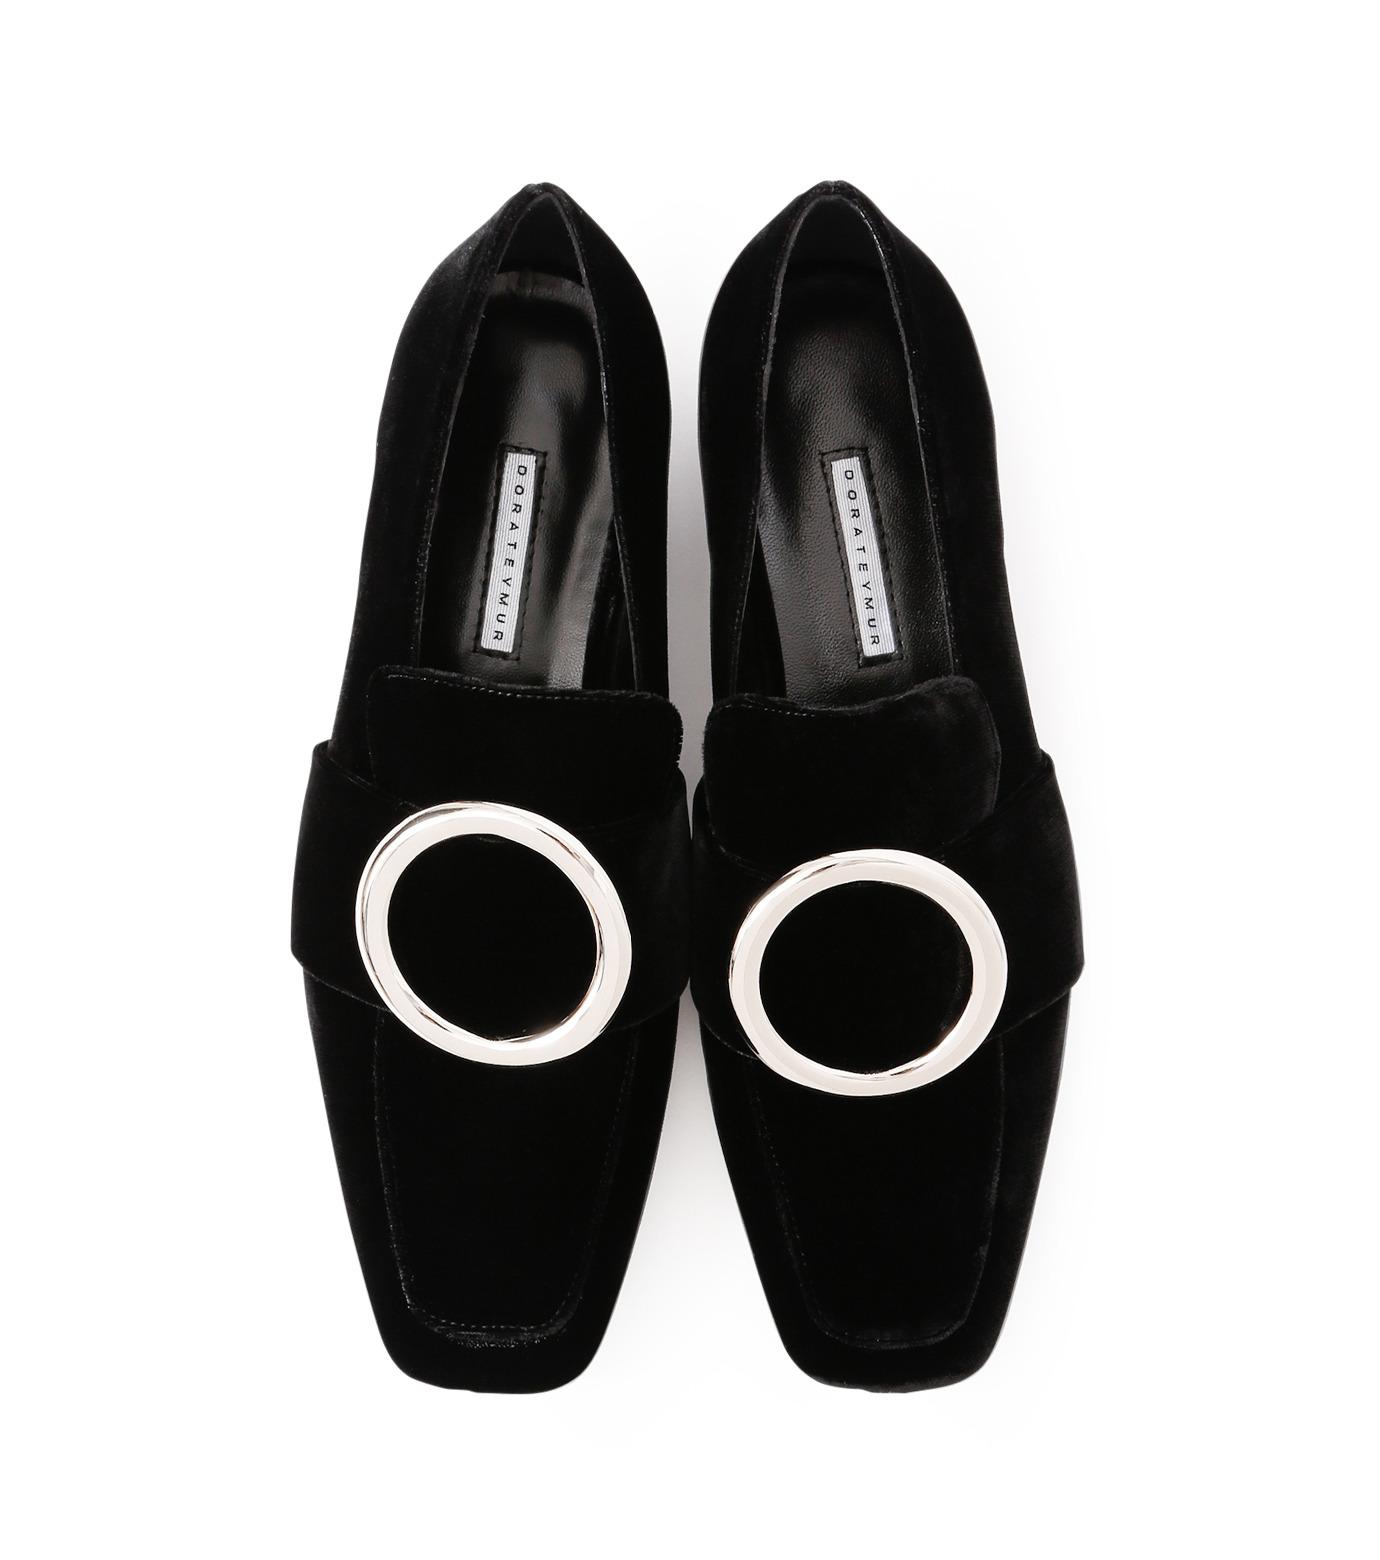 DORATEYMUR(ドラティムール)のRing Flat Shoes-BLACK(フラットシューズ/Flat shoes)-HARPUT-L-13 拡大詳細画像4